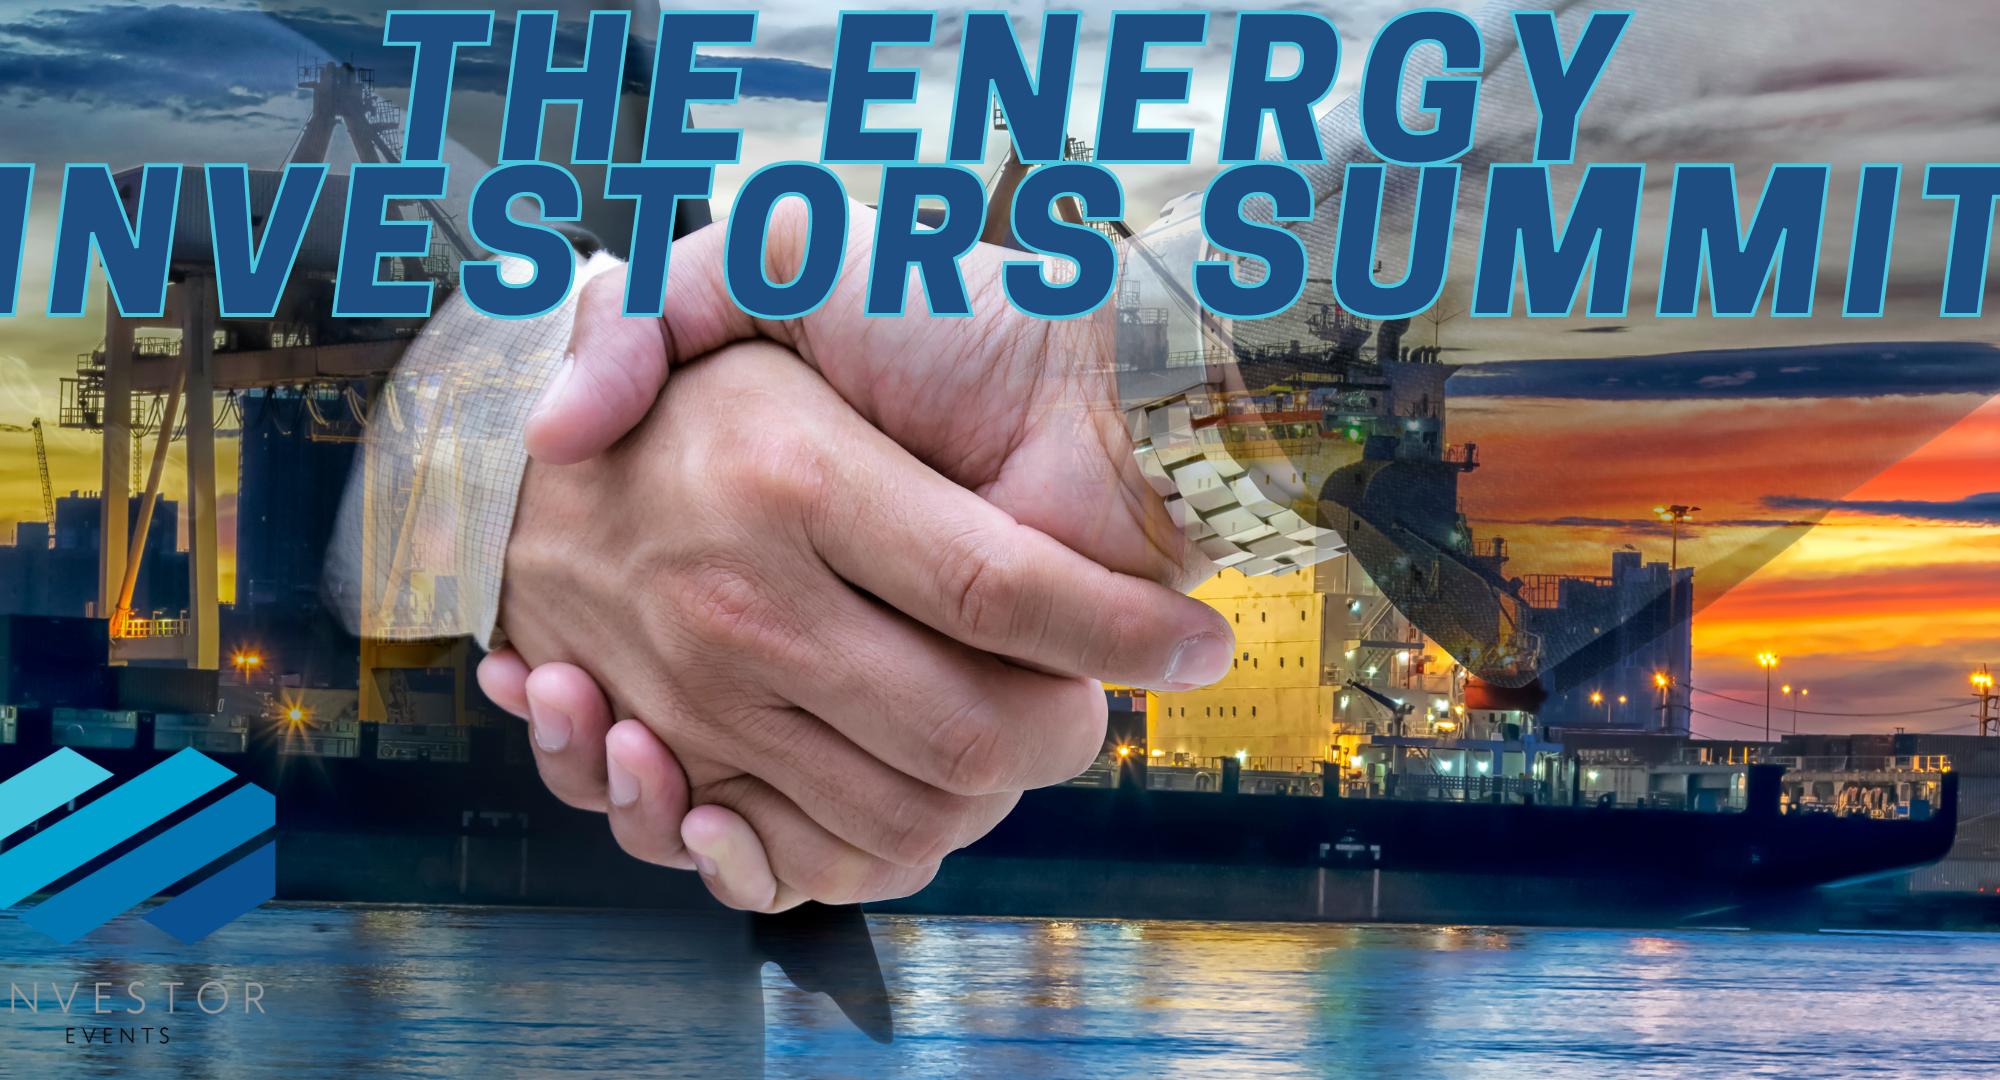 The Energy Investors Summit